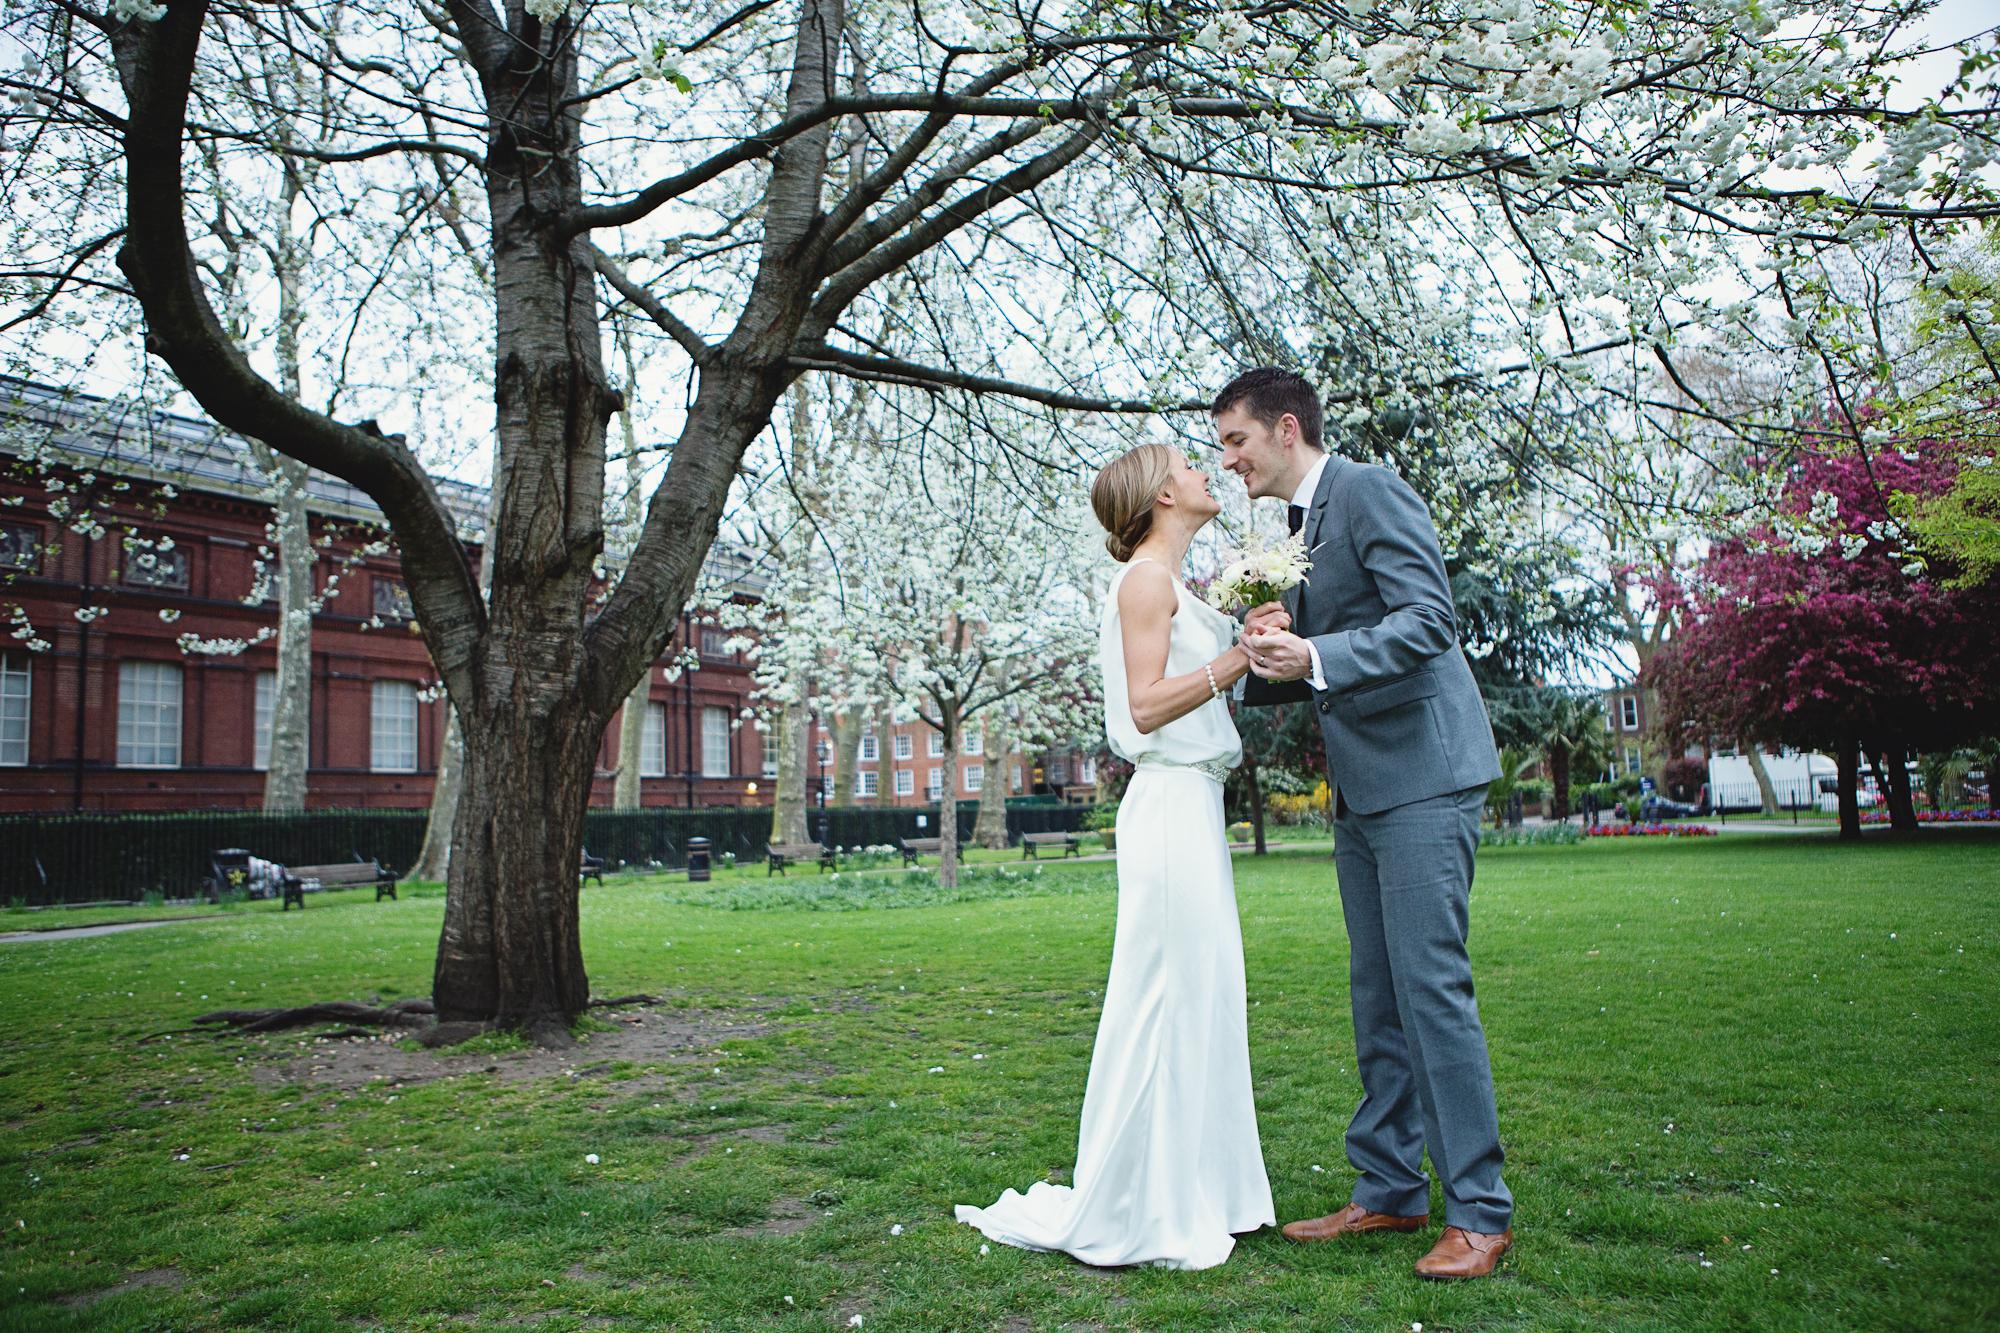 Islington Town Hall wedding - Alina Uritskaya Photography